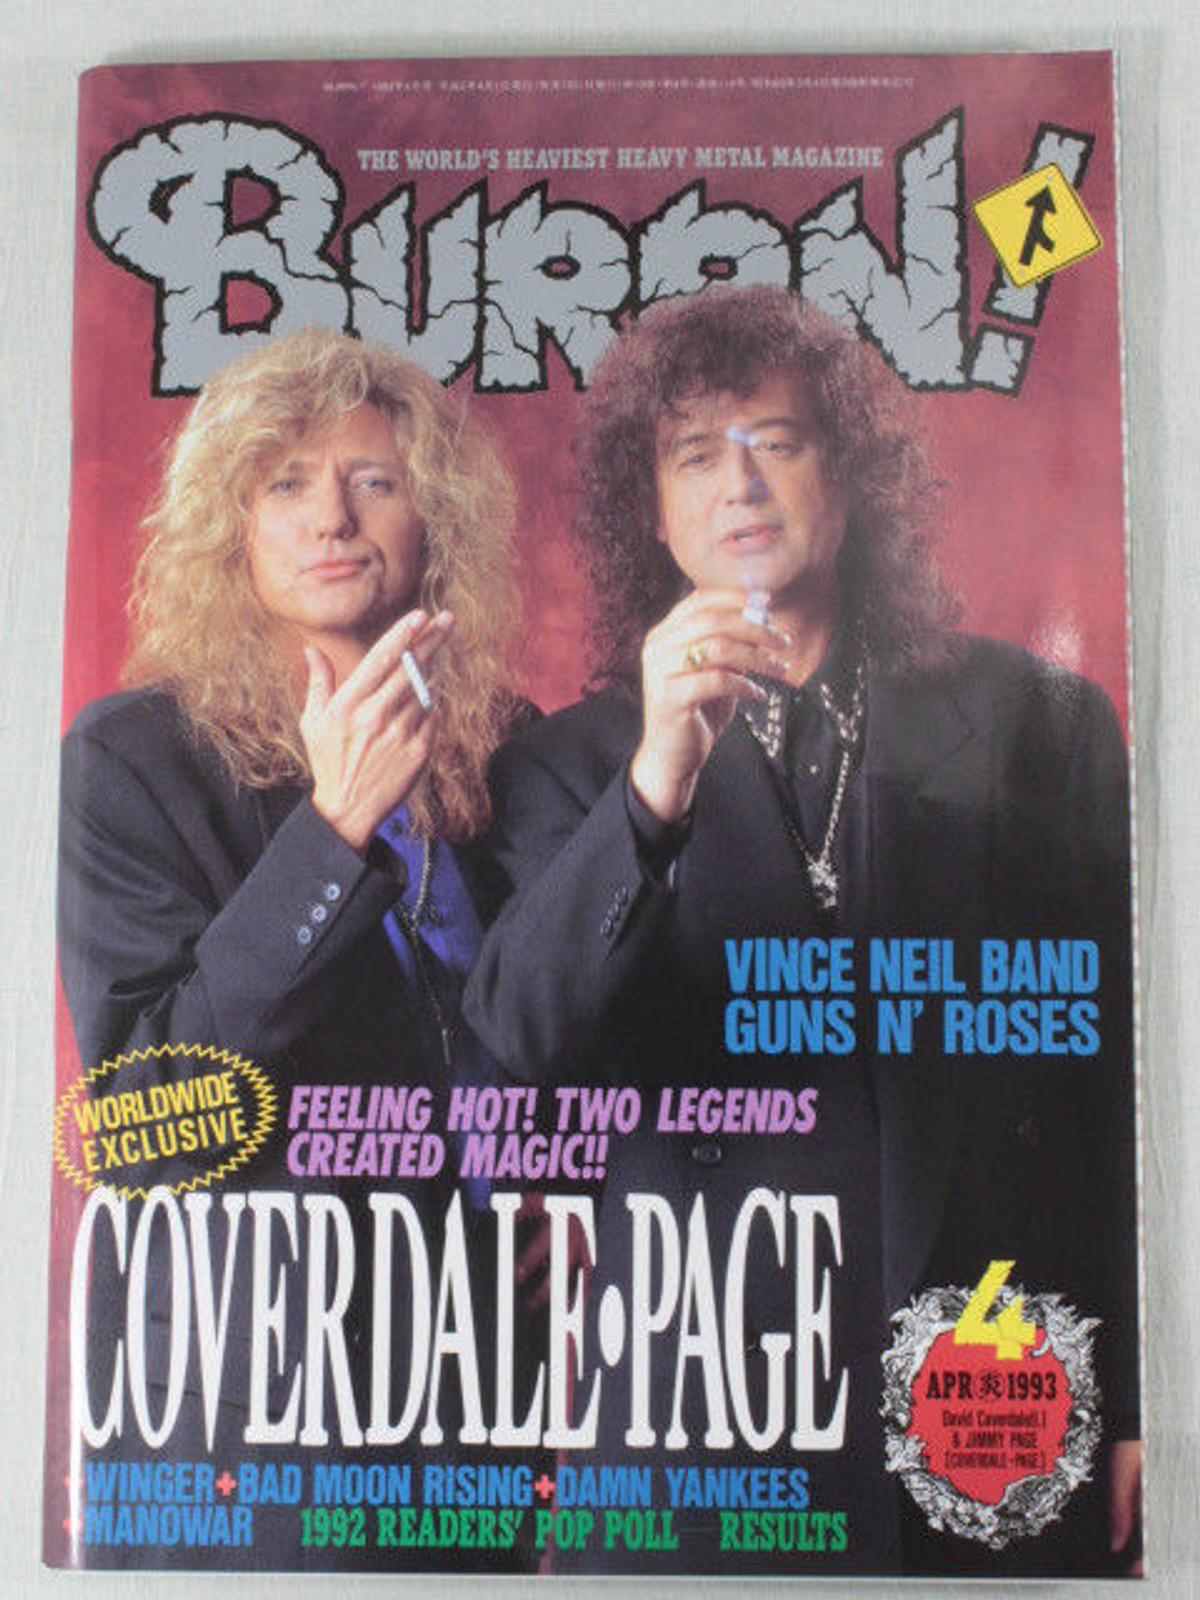 1993/04 BURRN! Japan Rock Magazine COVERDALE PAGE/VINCE NIEL/GUNS N' ROSES